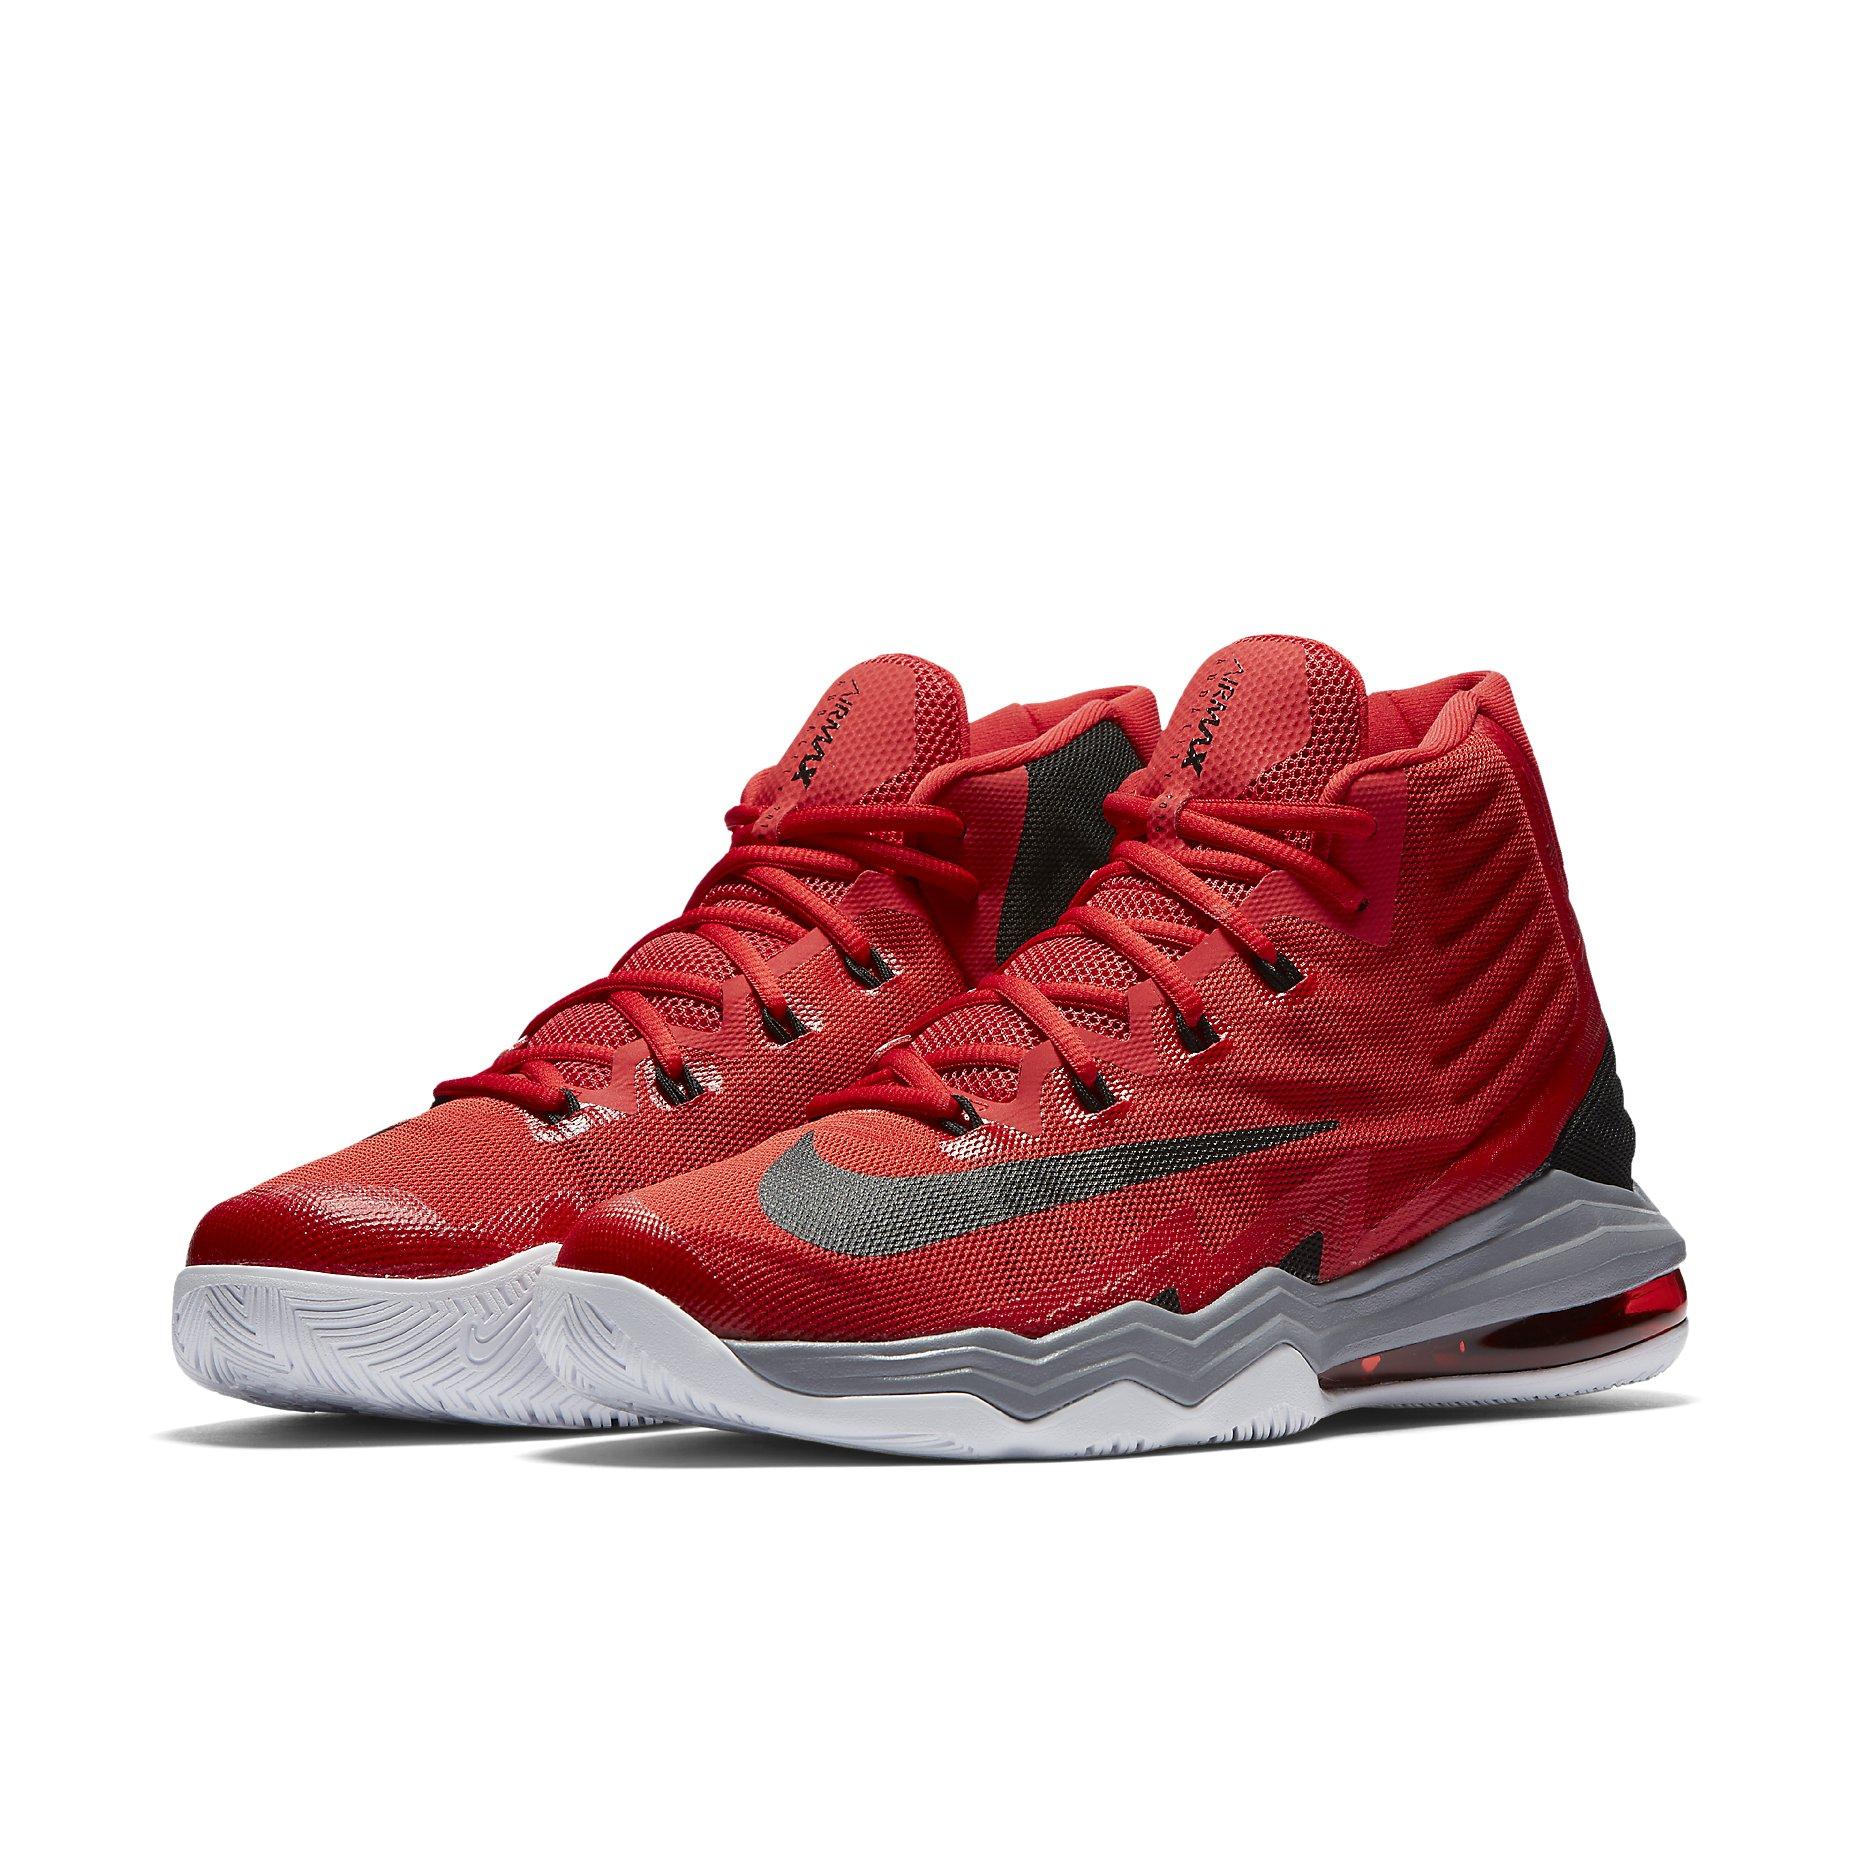 Chaussure de basketball Nike Air Max Audacity 2016 pour